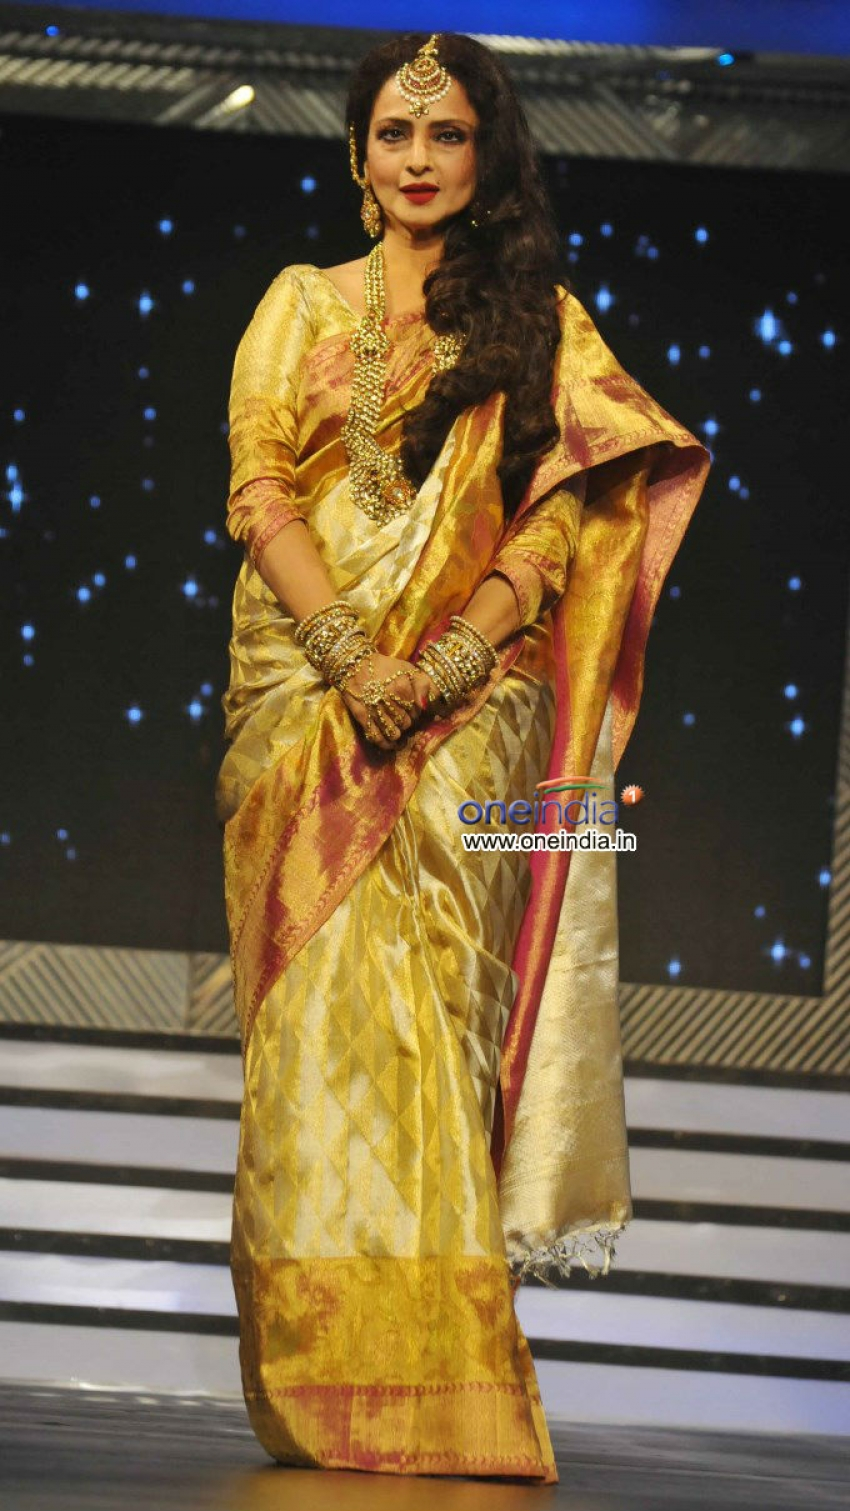 Late Yash Chopra's 81st birthday celebration Photos